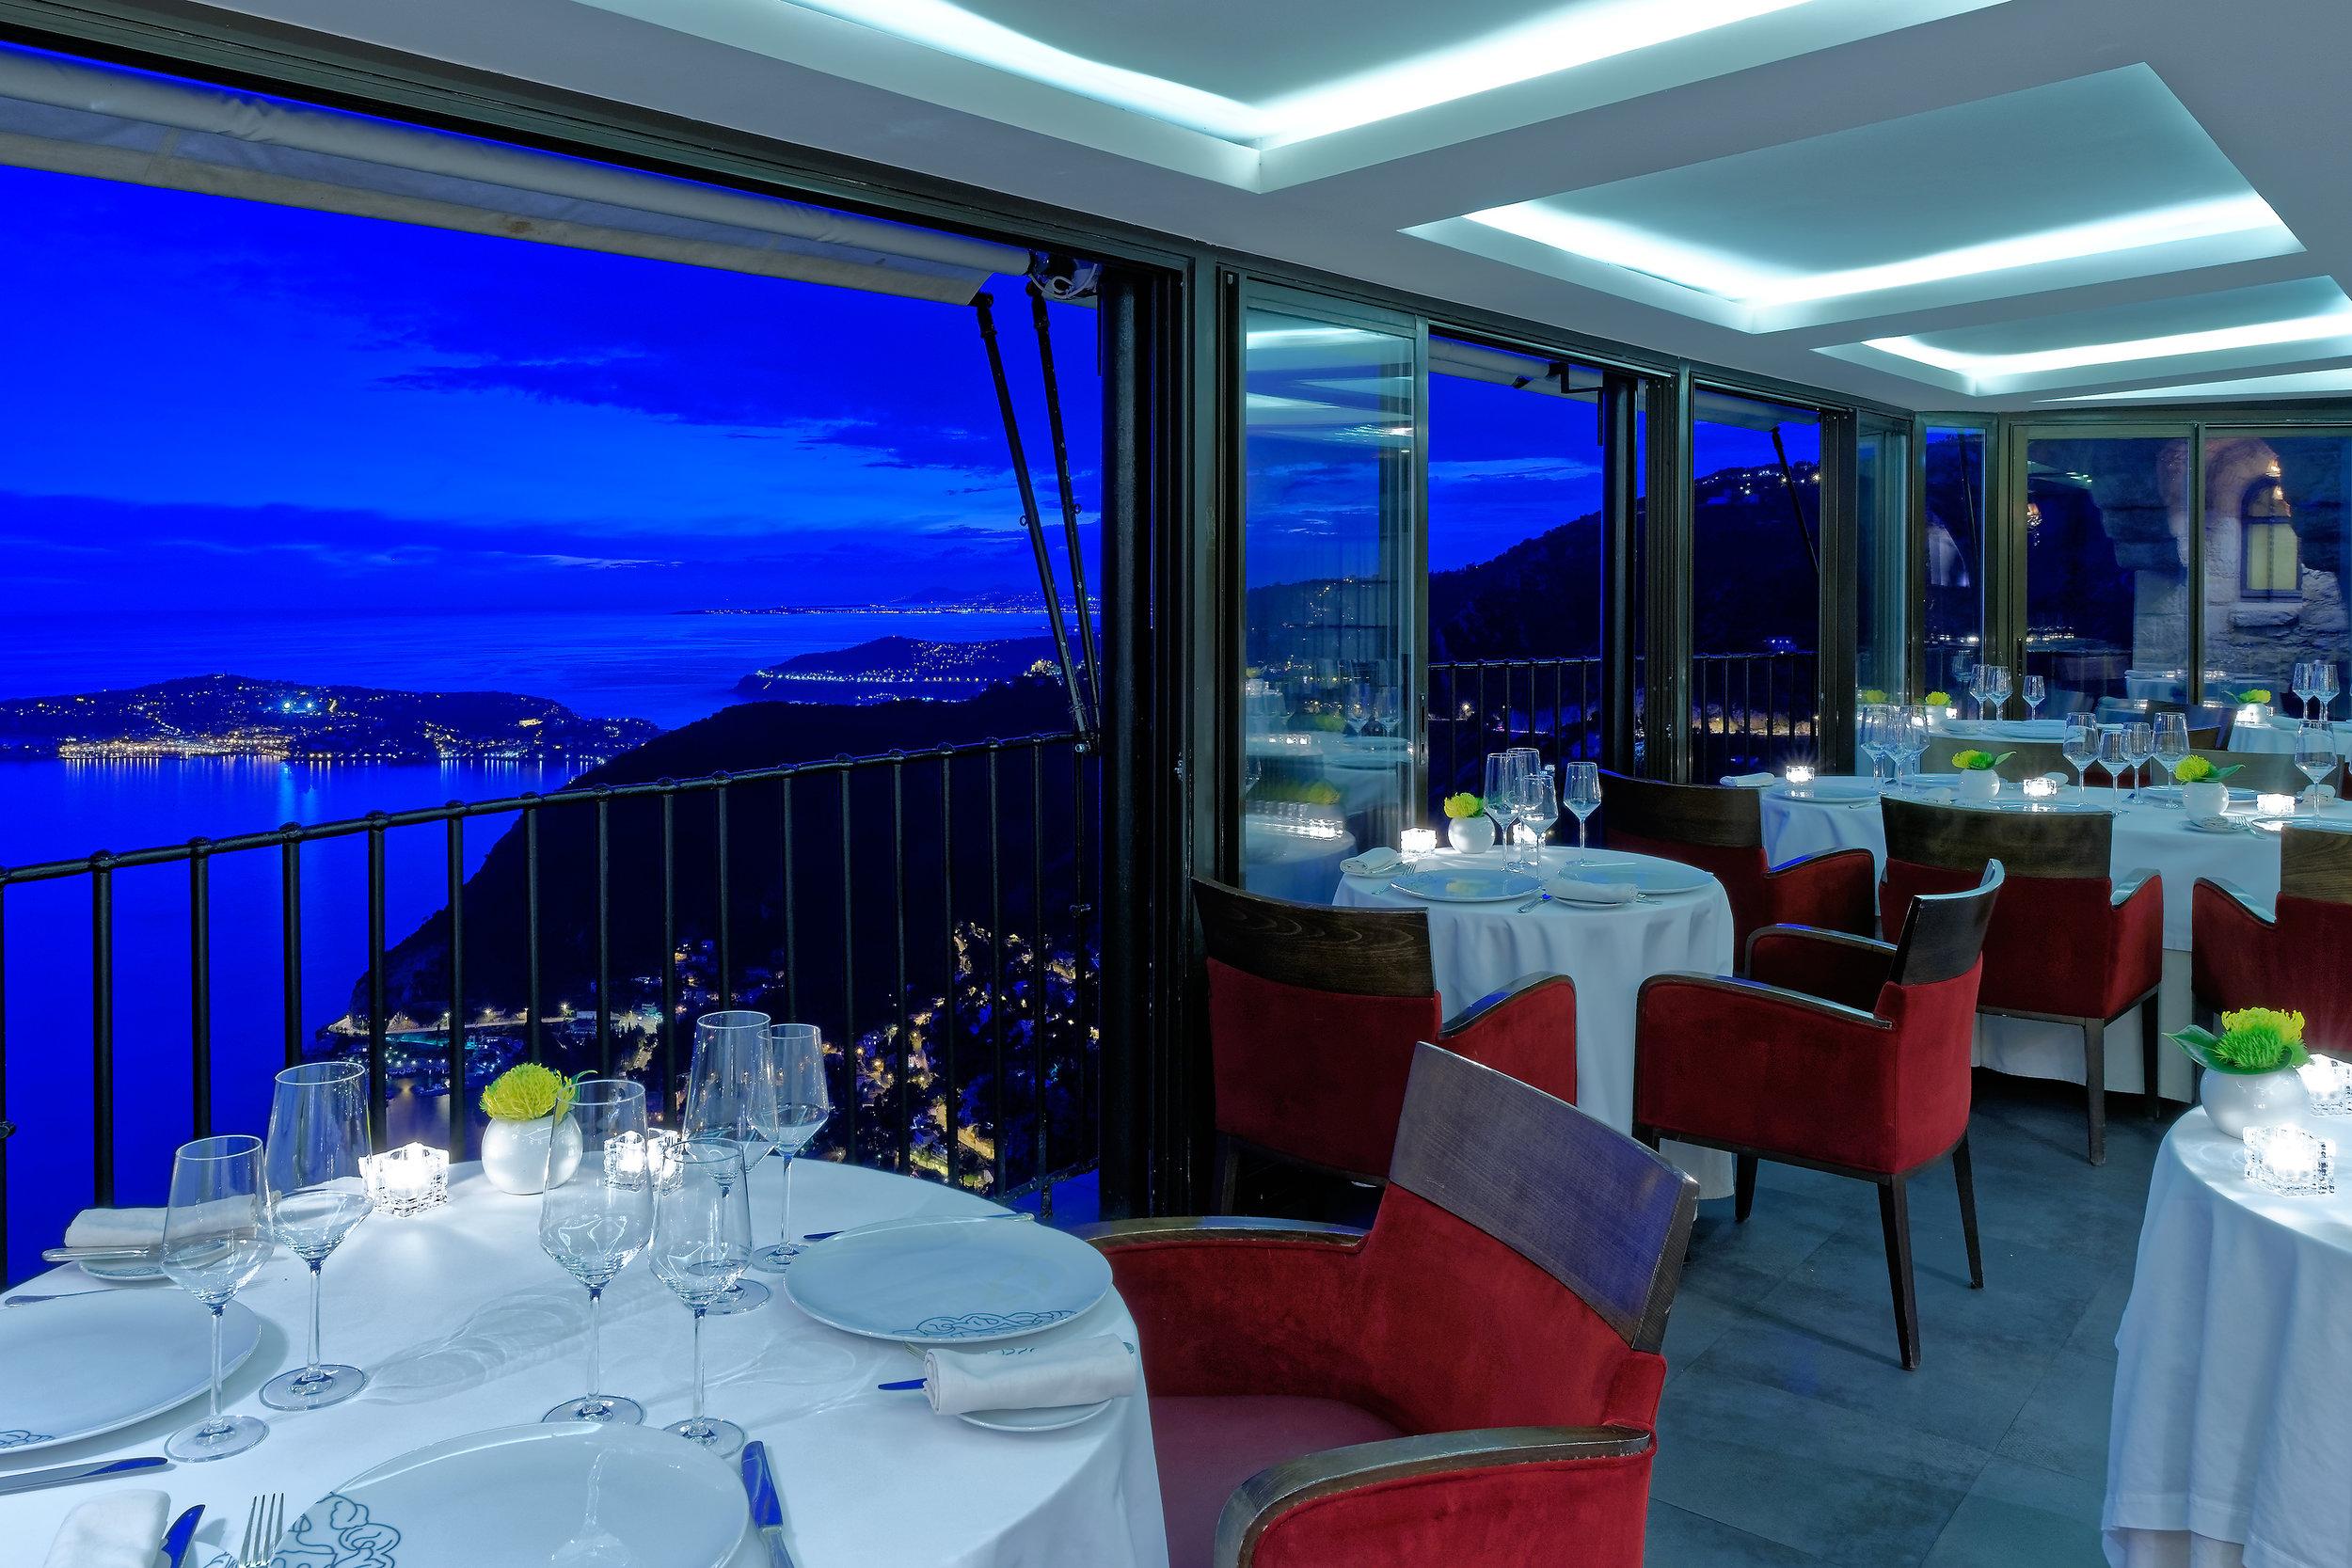 Philippe_Hahn_restaurant_eza.jpg